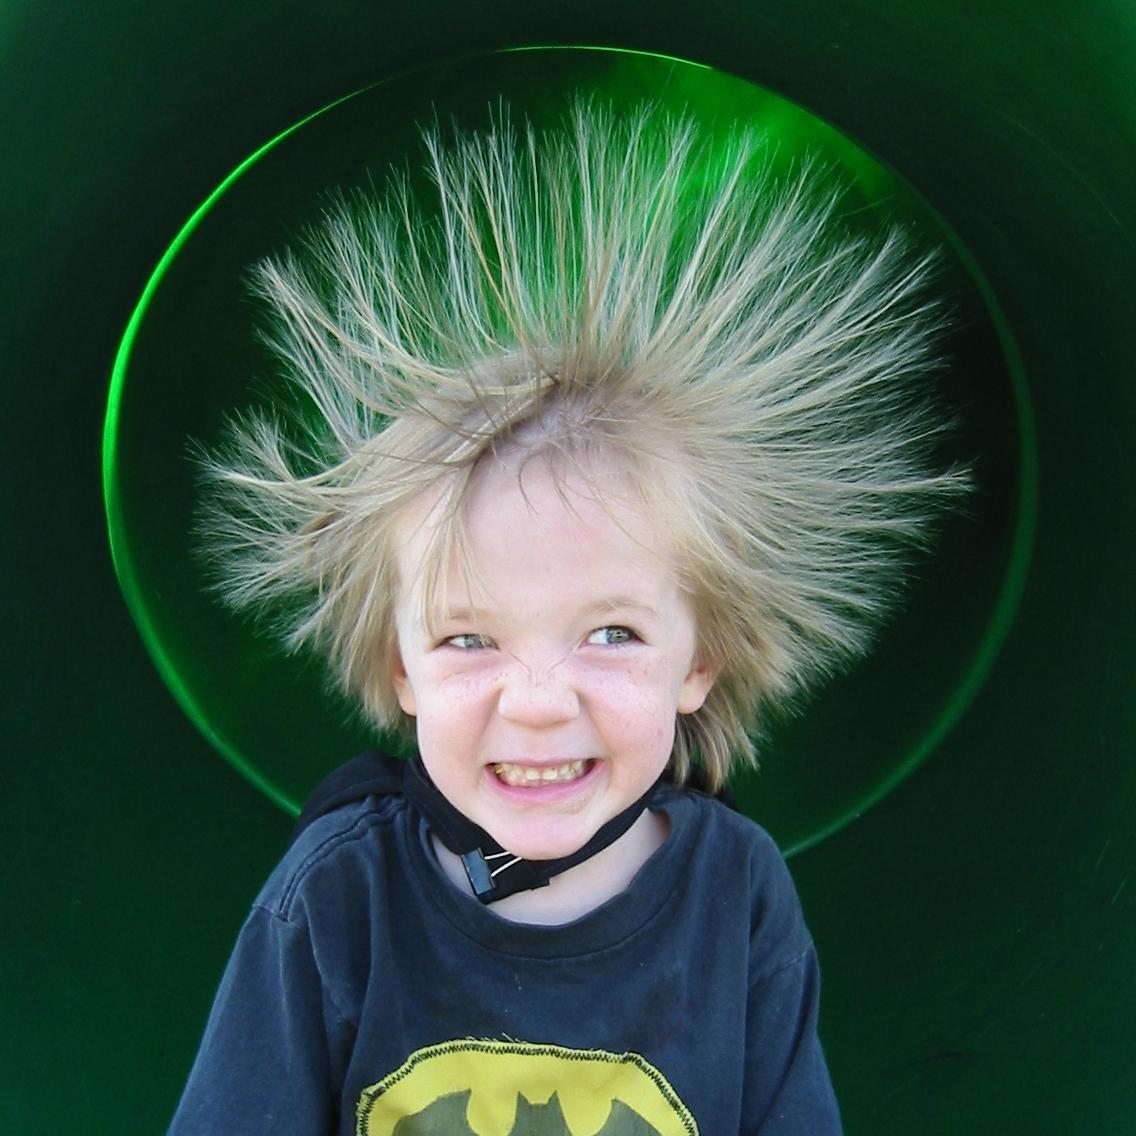 http://3.bp.blogspot.com/-Lb8DaHNQt1Y/TxHqqY_ijpI/AAAAAAAADtI/0YL23FbFDoc/s1600/static-hair.jpg